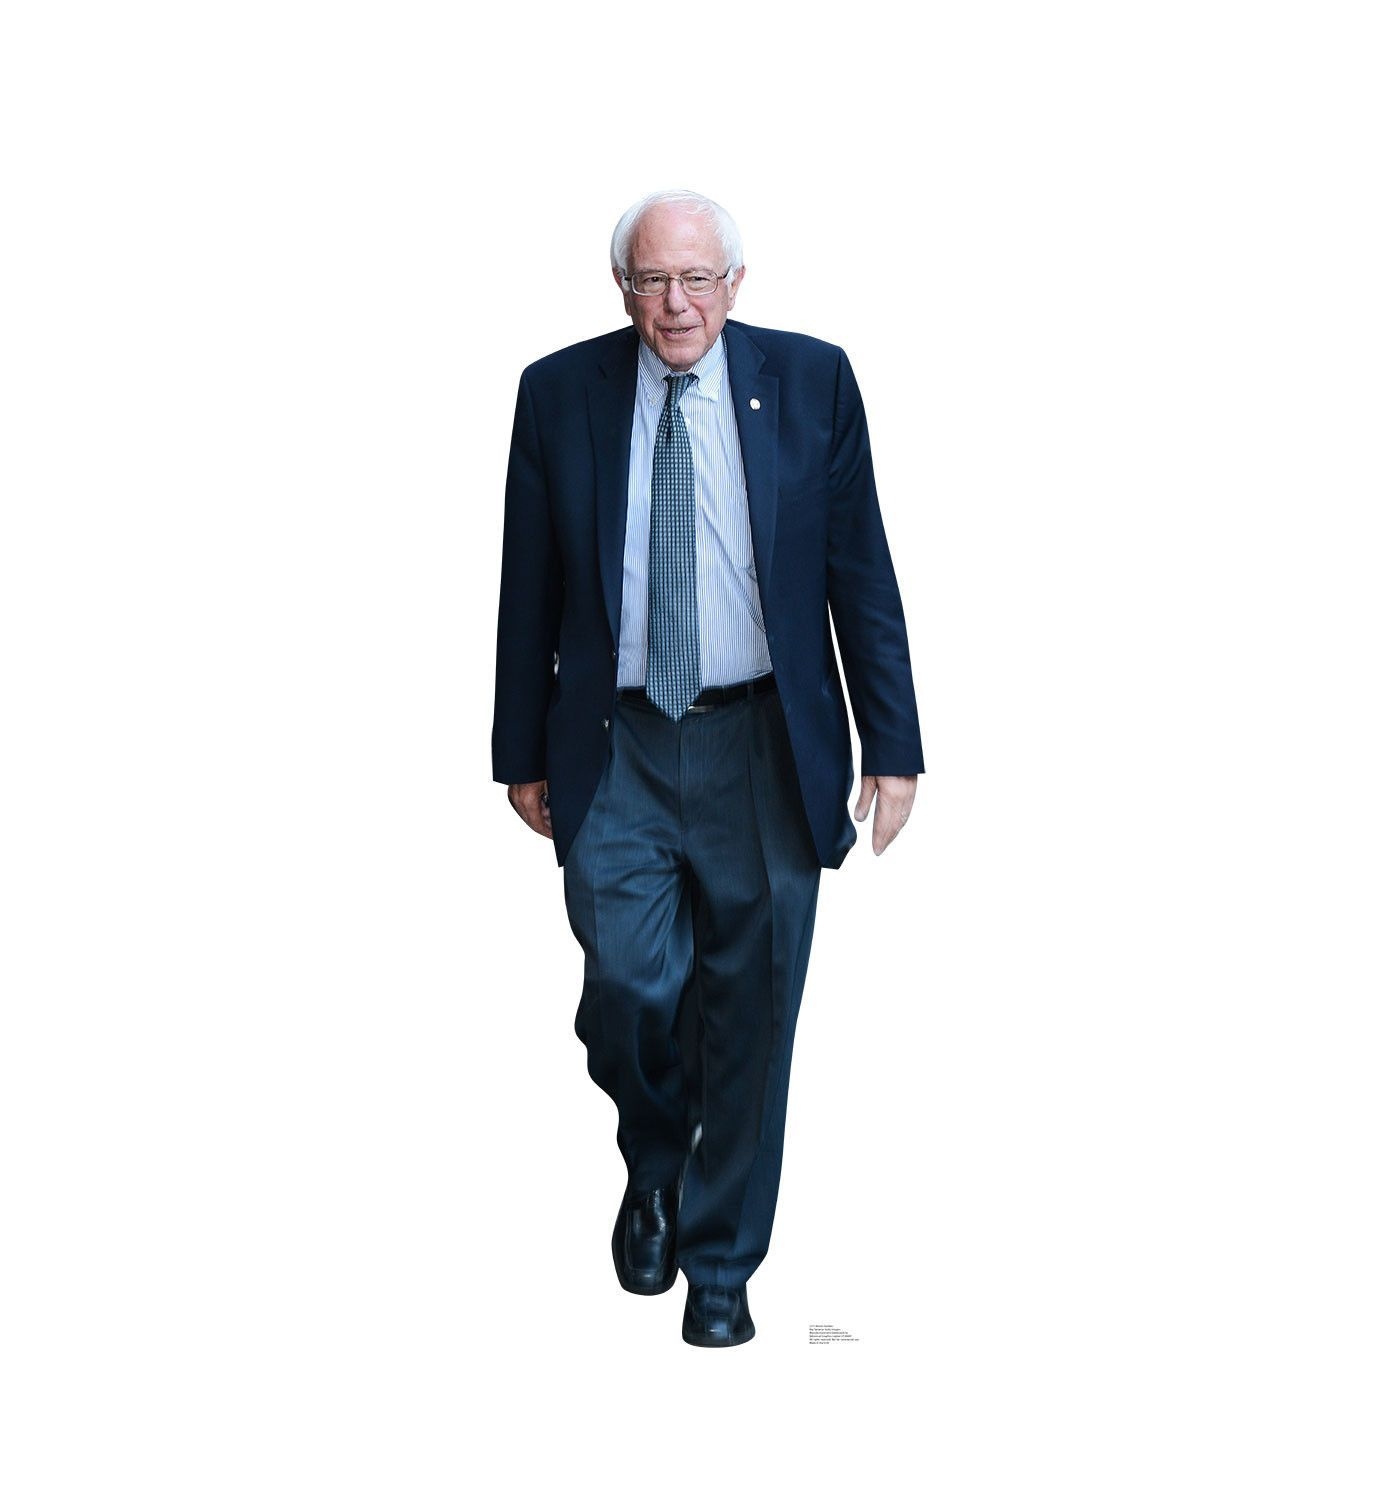 Bernie sanders life size cardboard cutout life size